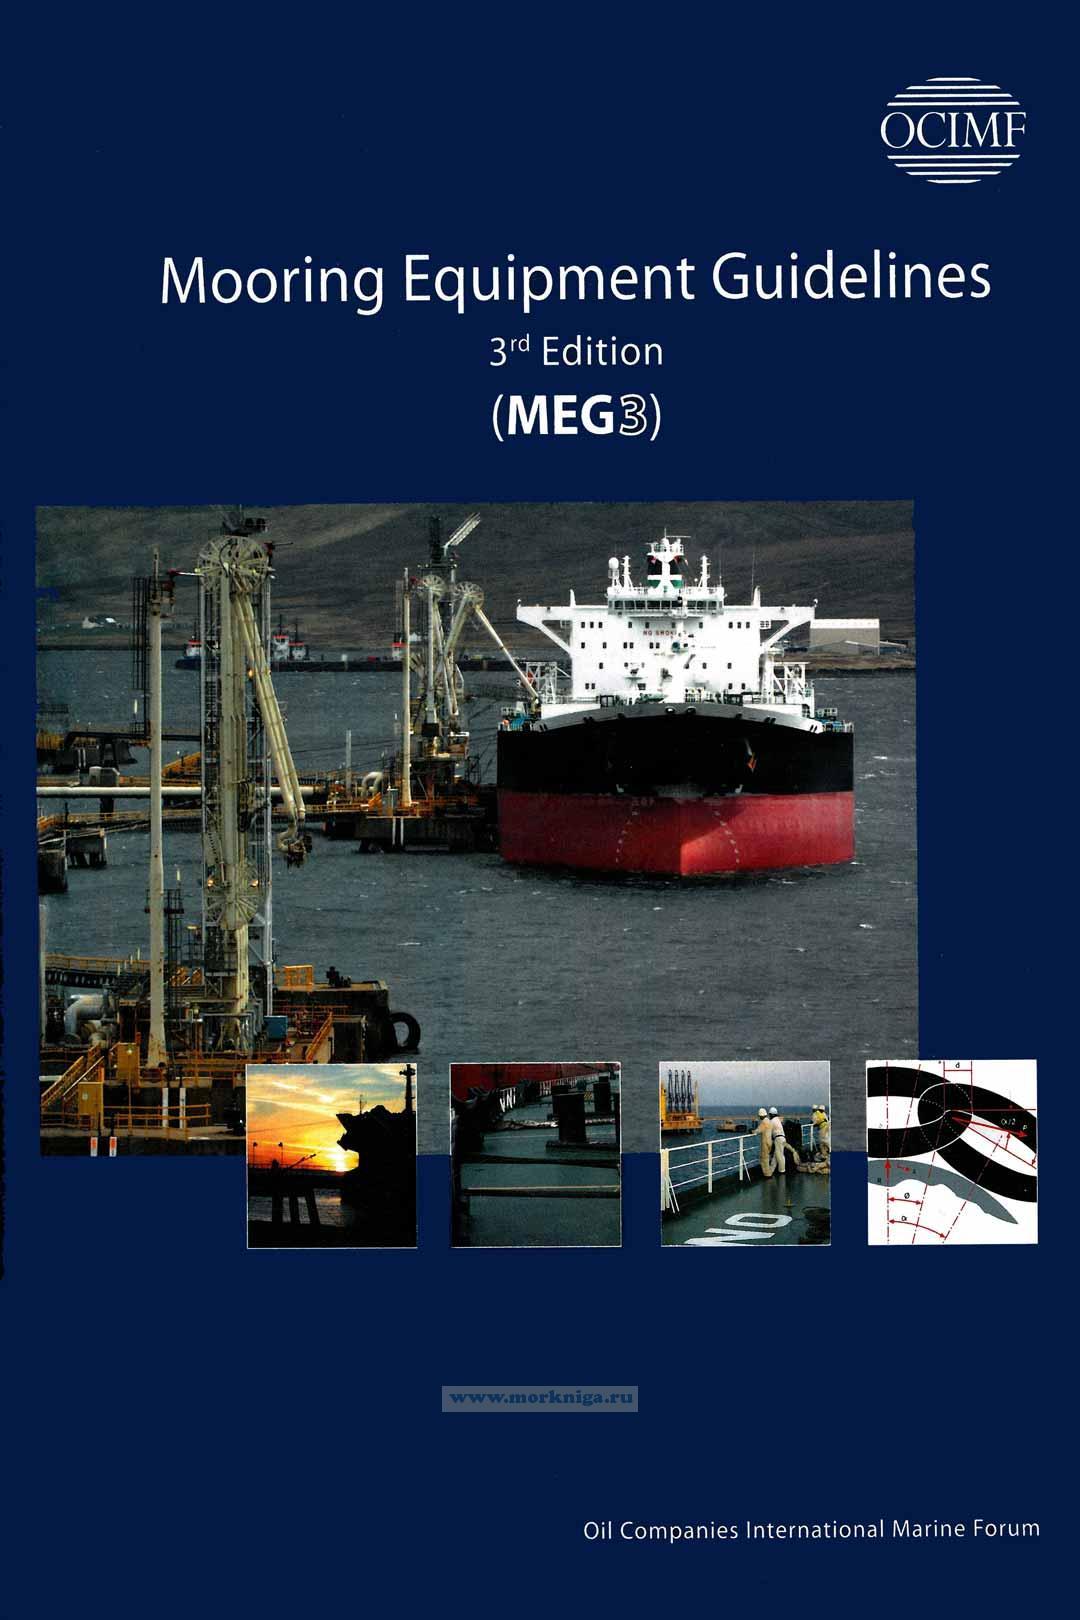 mooring equipment guidelines rh morkniga ru mooring equipment guidelines 4 pdf mooring equipment guidelines 4